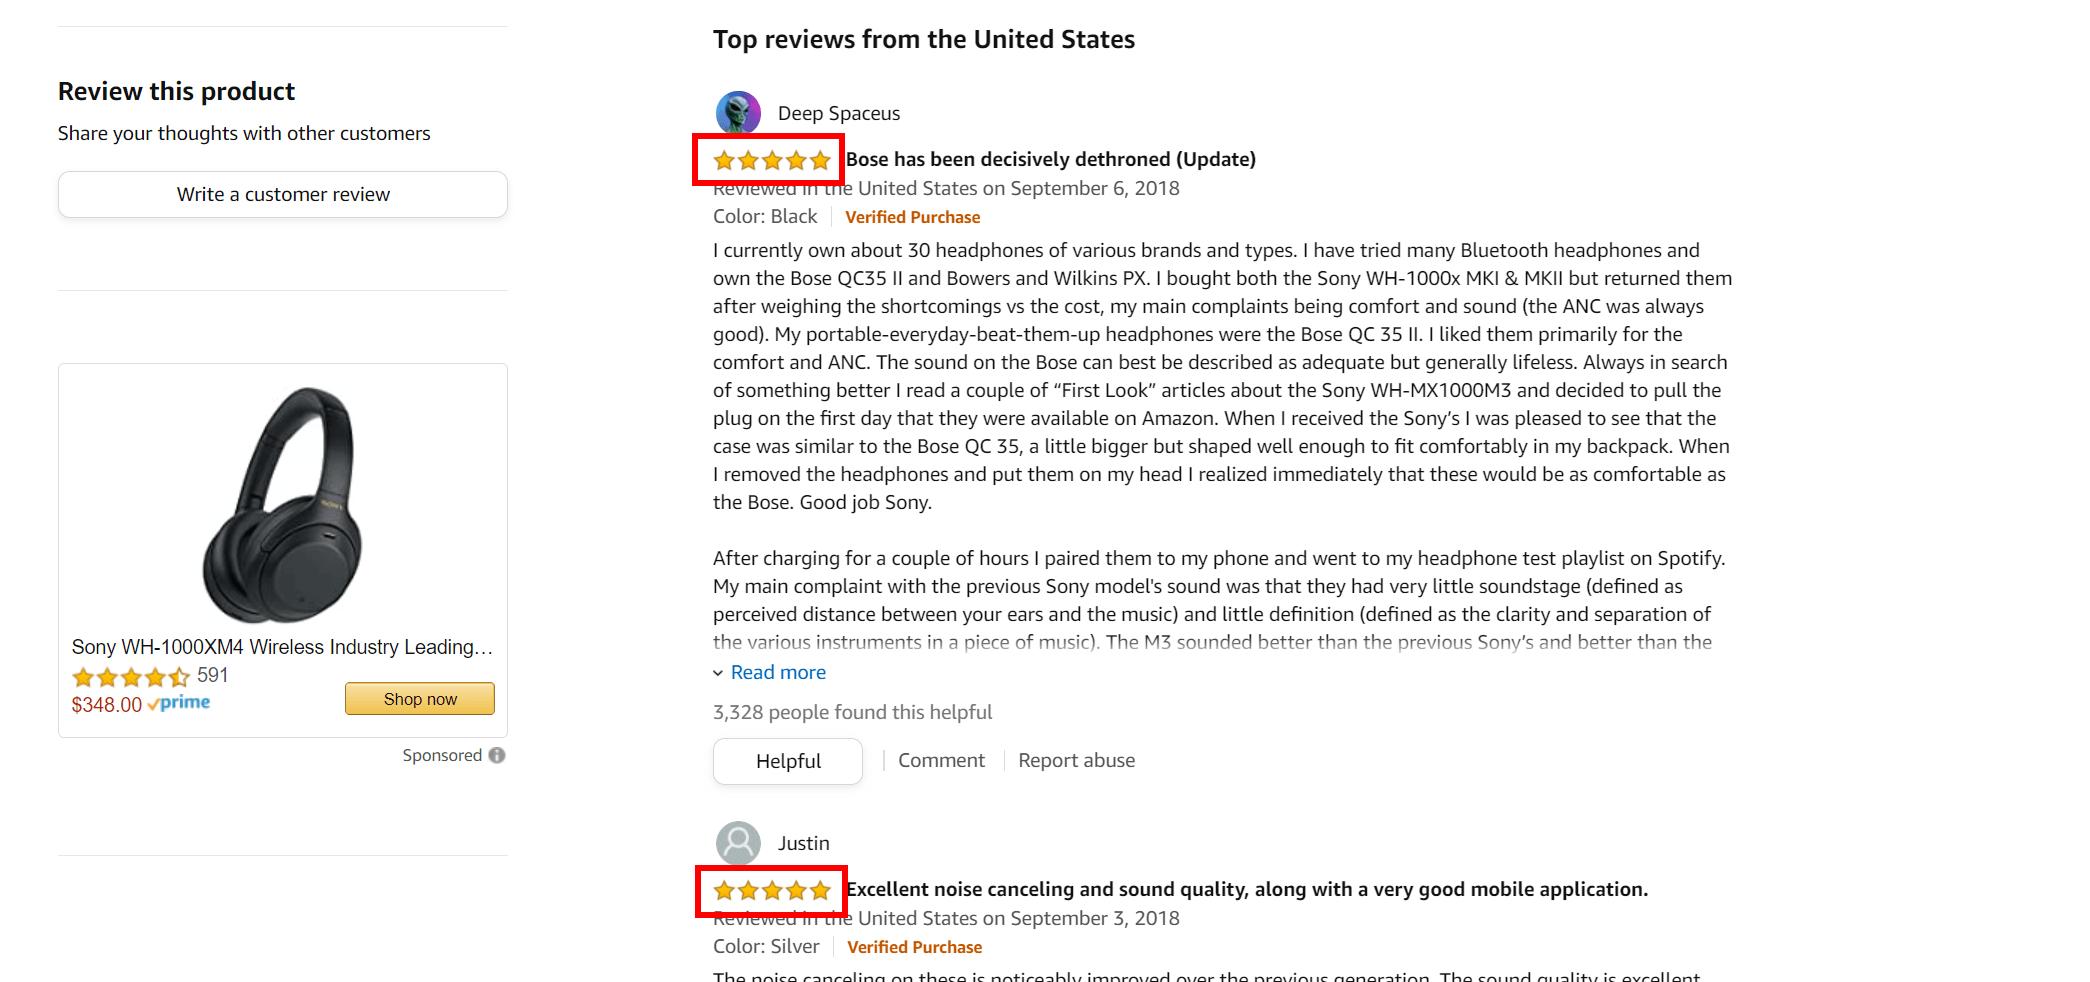 Two positive reviews of Sony headphones on Amazon